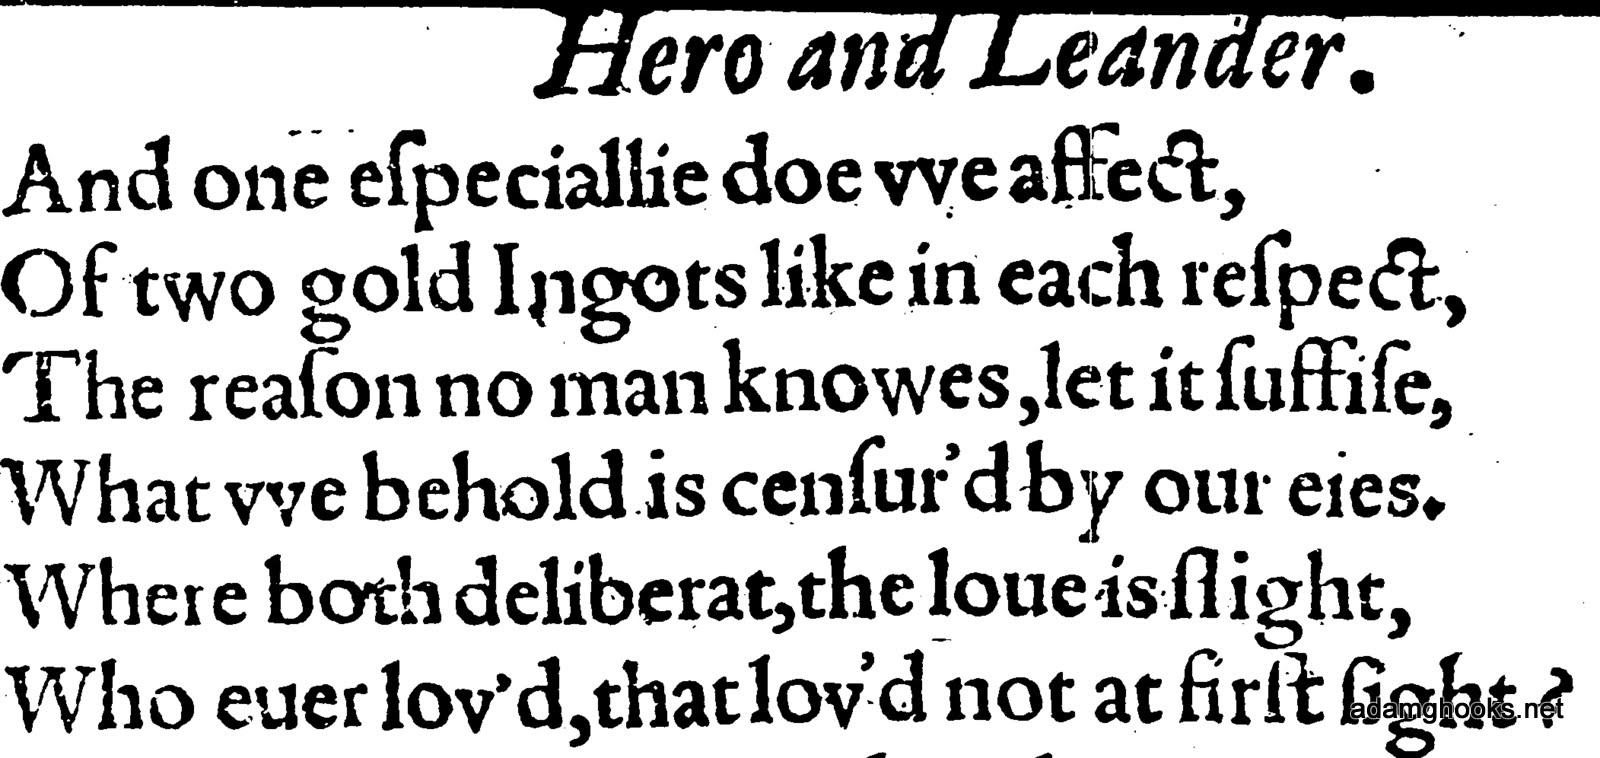 Winter      doc doc Marlowe s Edward II  Penetrating Language in Shakespeare s Richard II    Essay   eNotes com